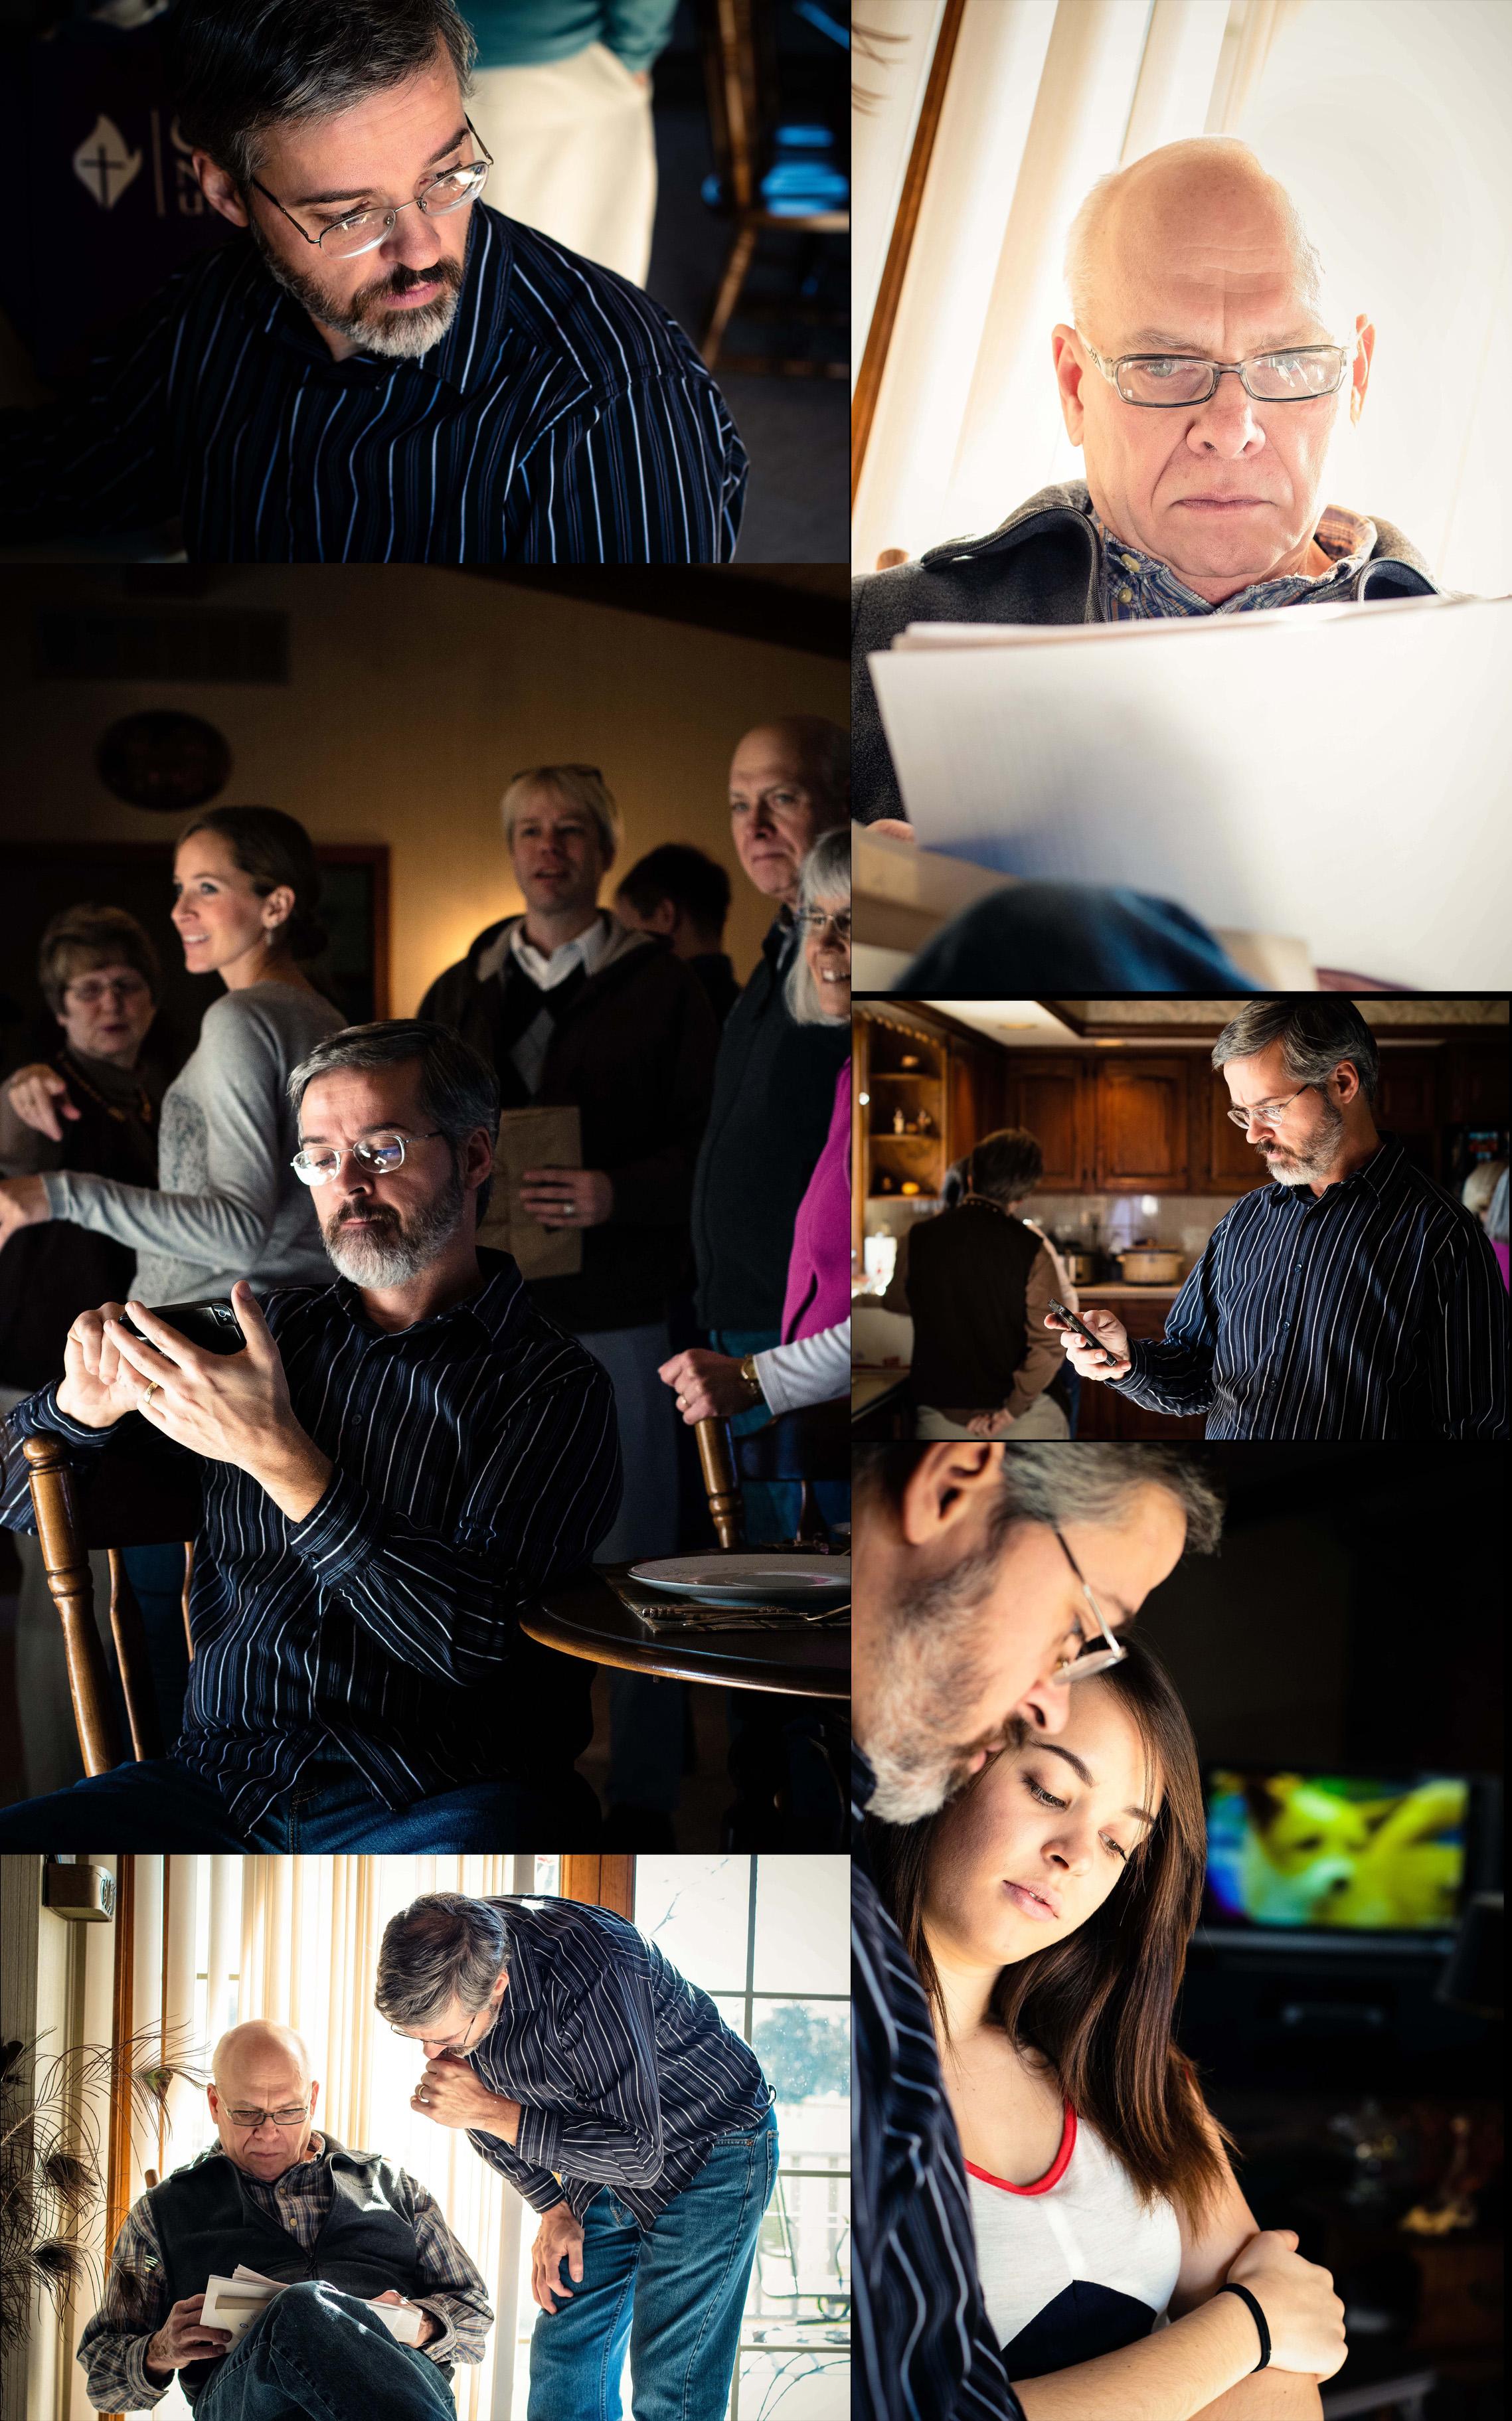 emily wilson photos thanksgiving 2013 (2).jpg